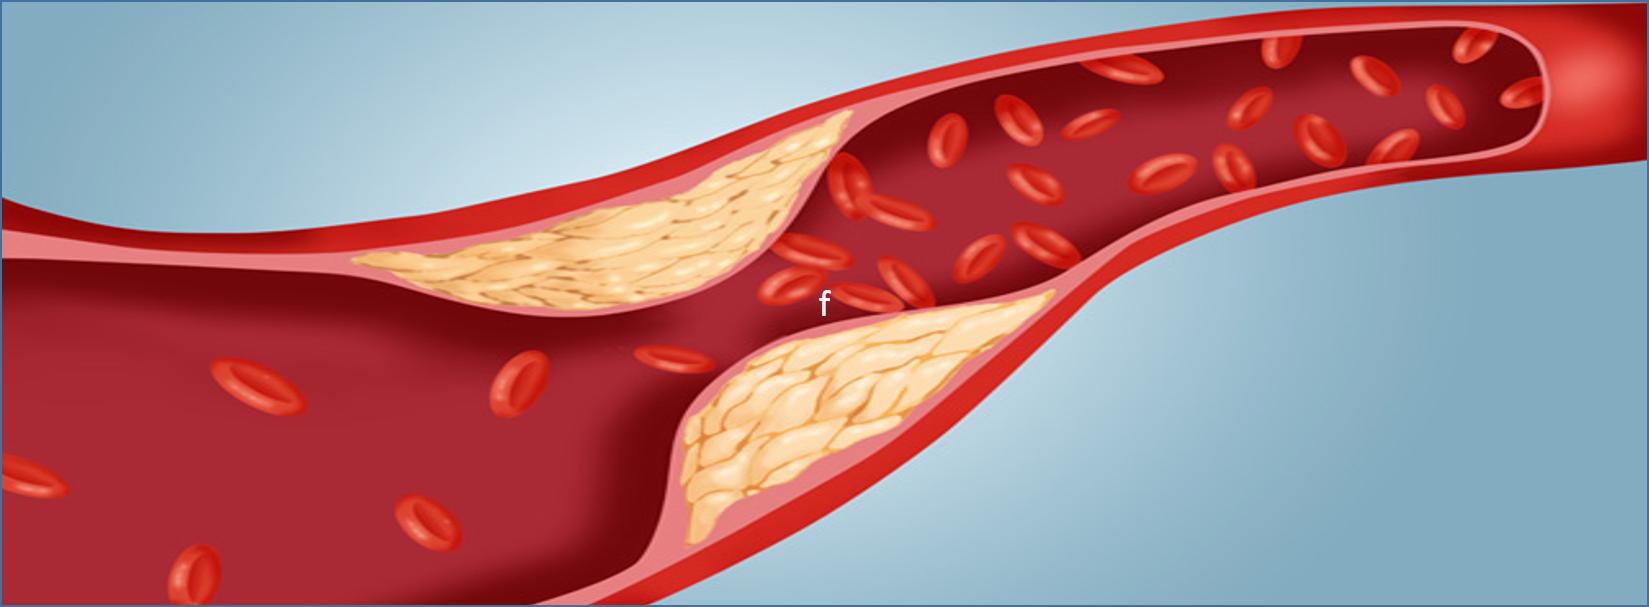 Kolestaroolka (Cholesterol)